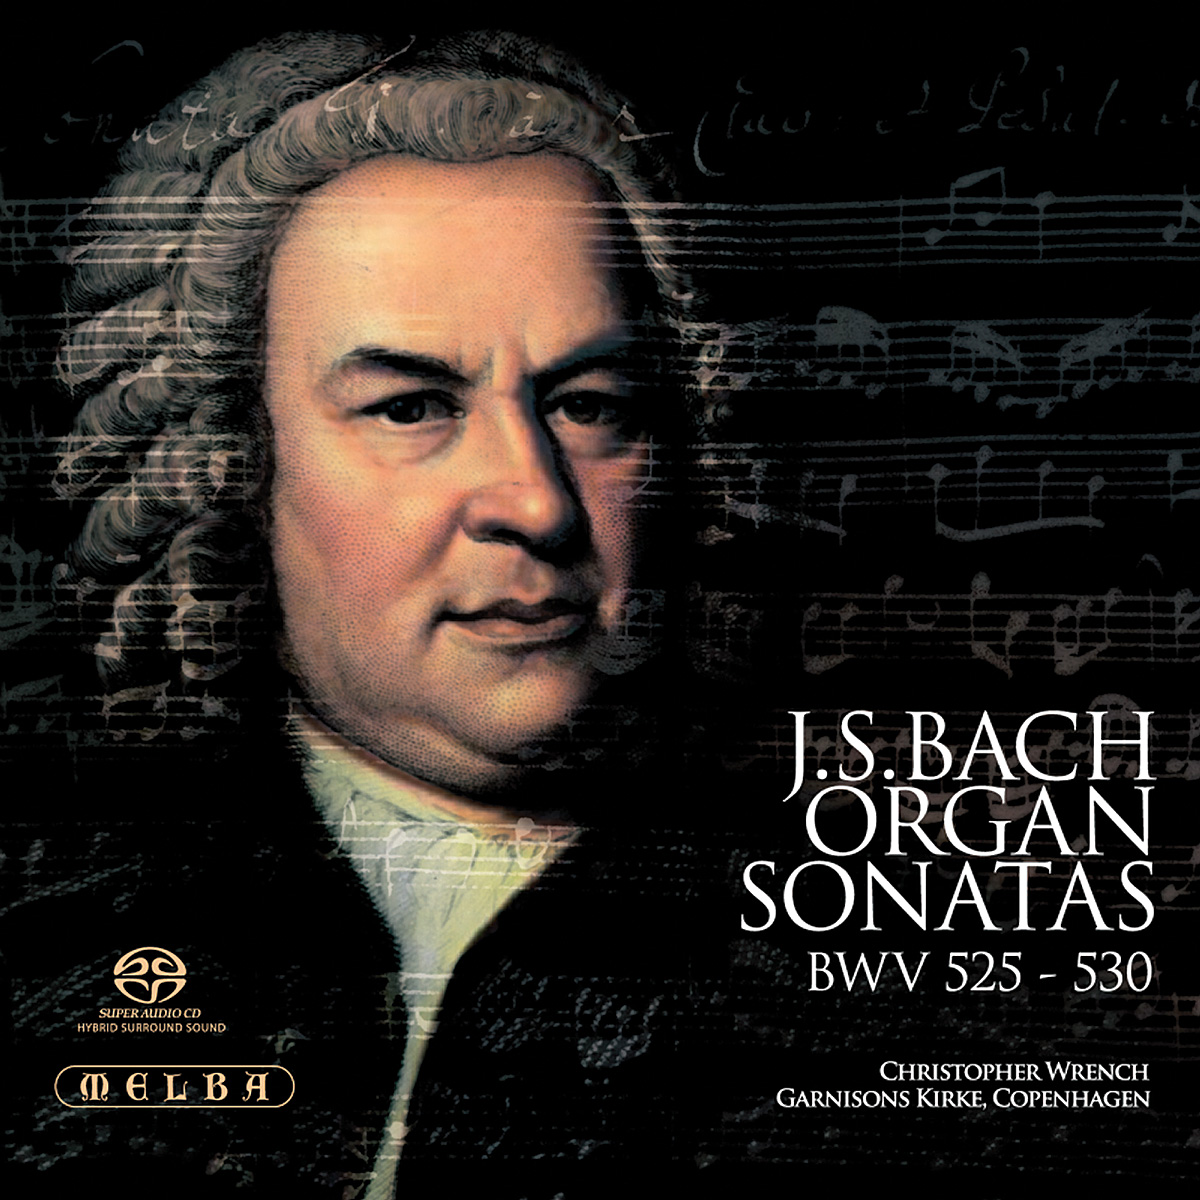 Johann Sebastian Bach - Cantata No. 4